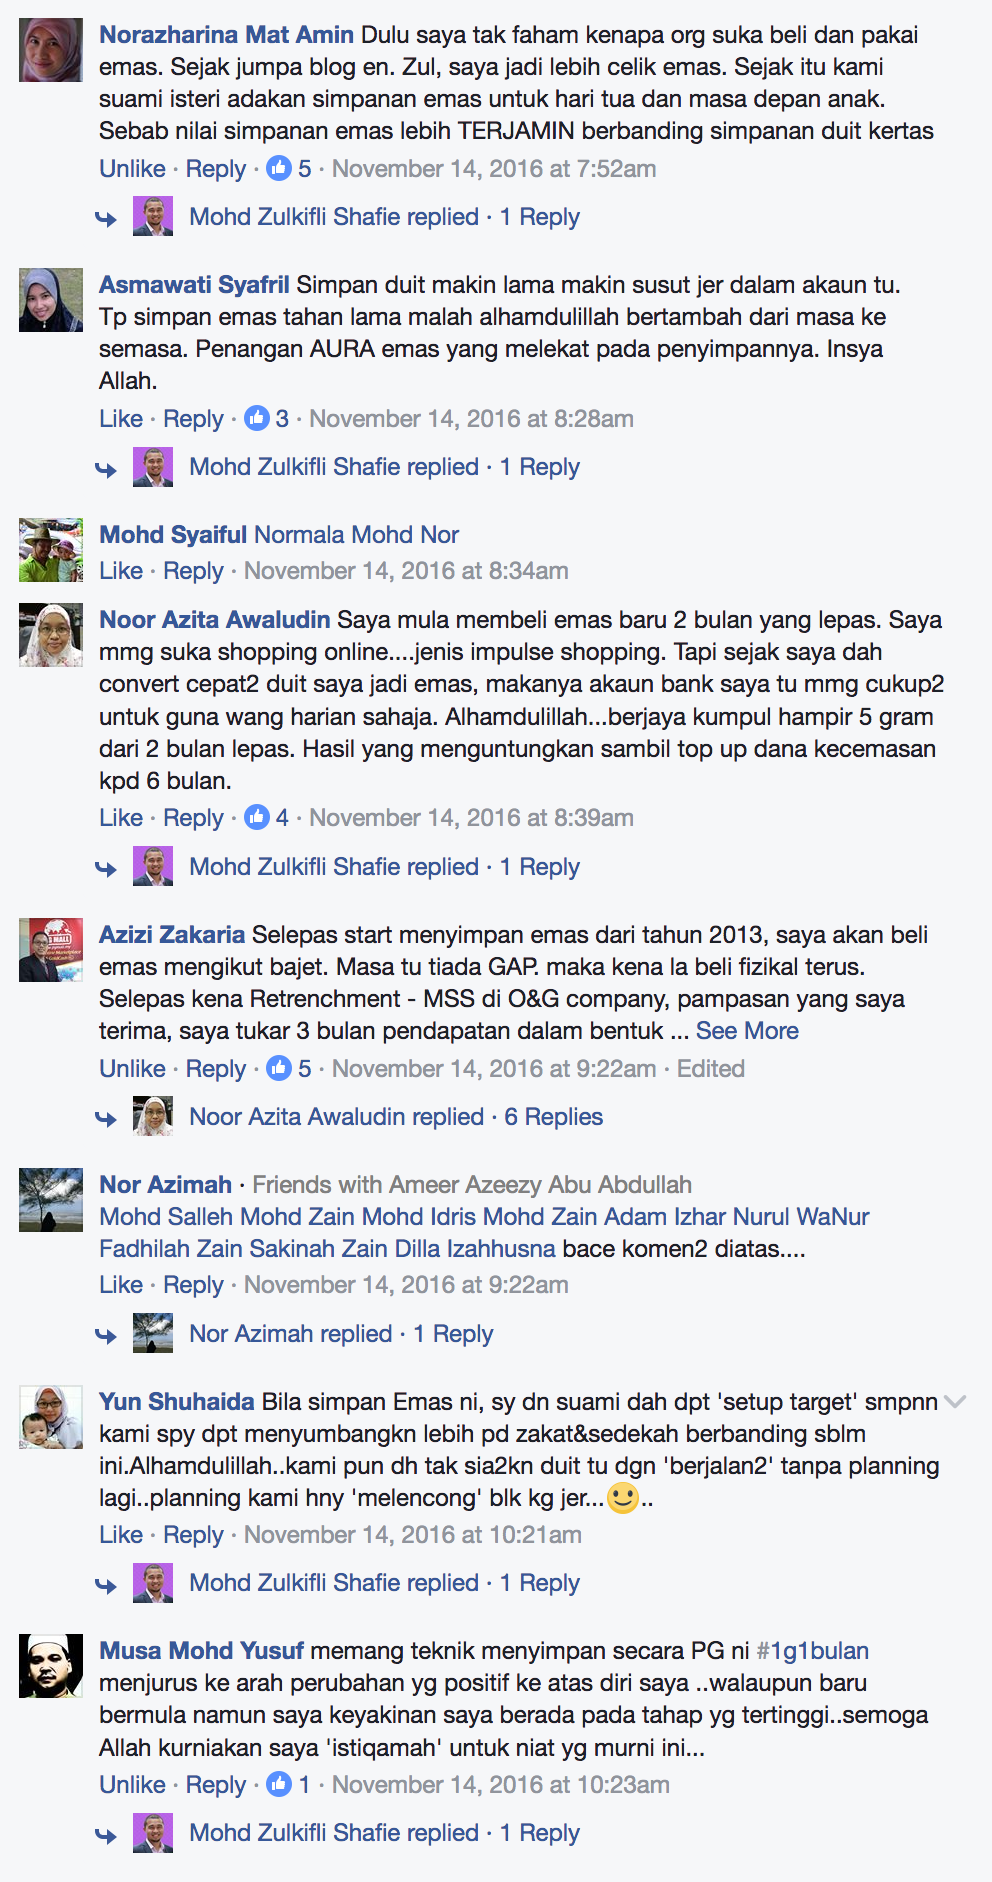 FB Screen Shot testimoni penyimpan emas 4